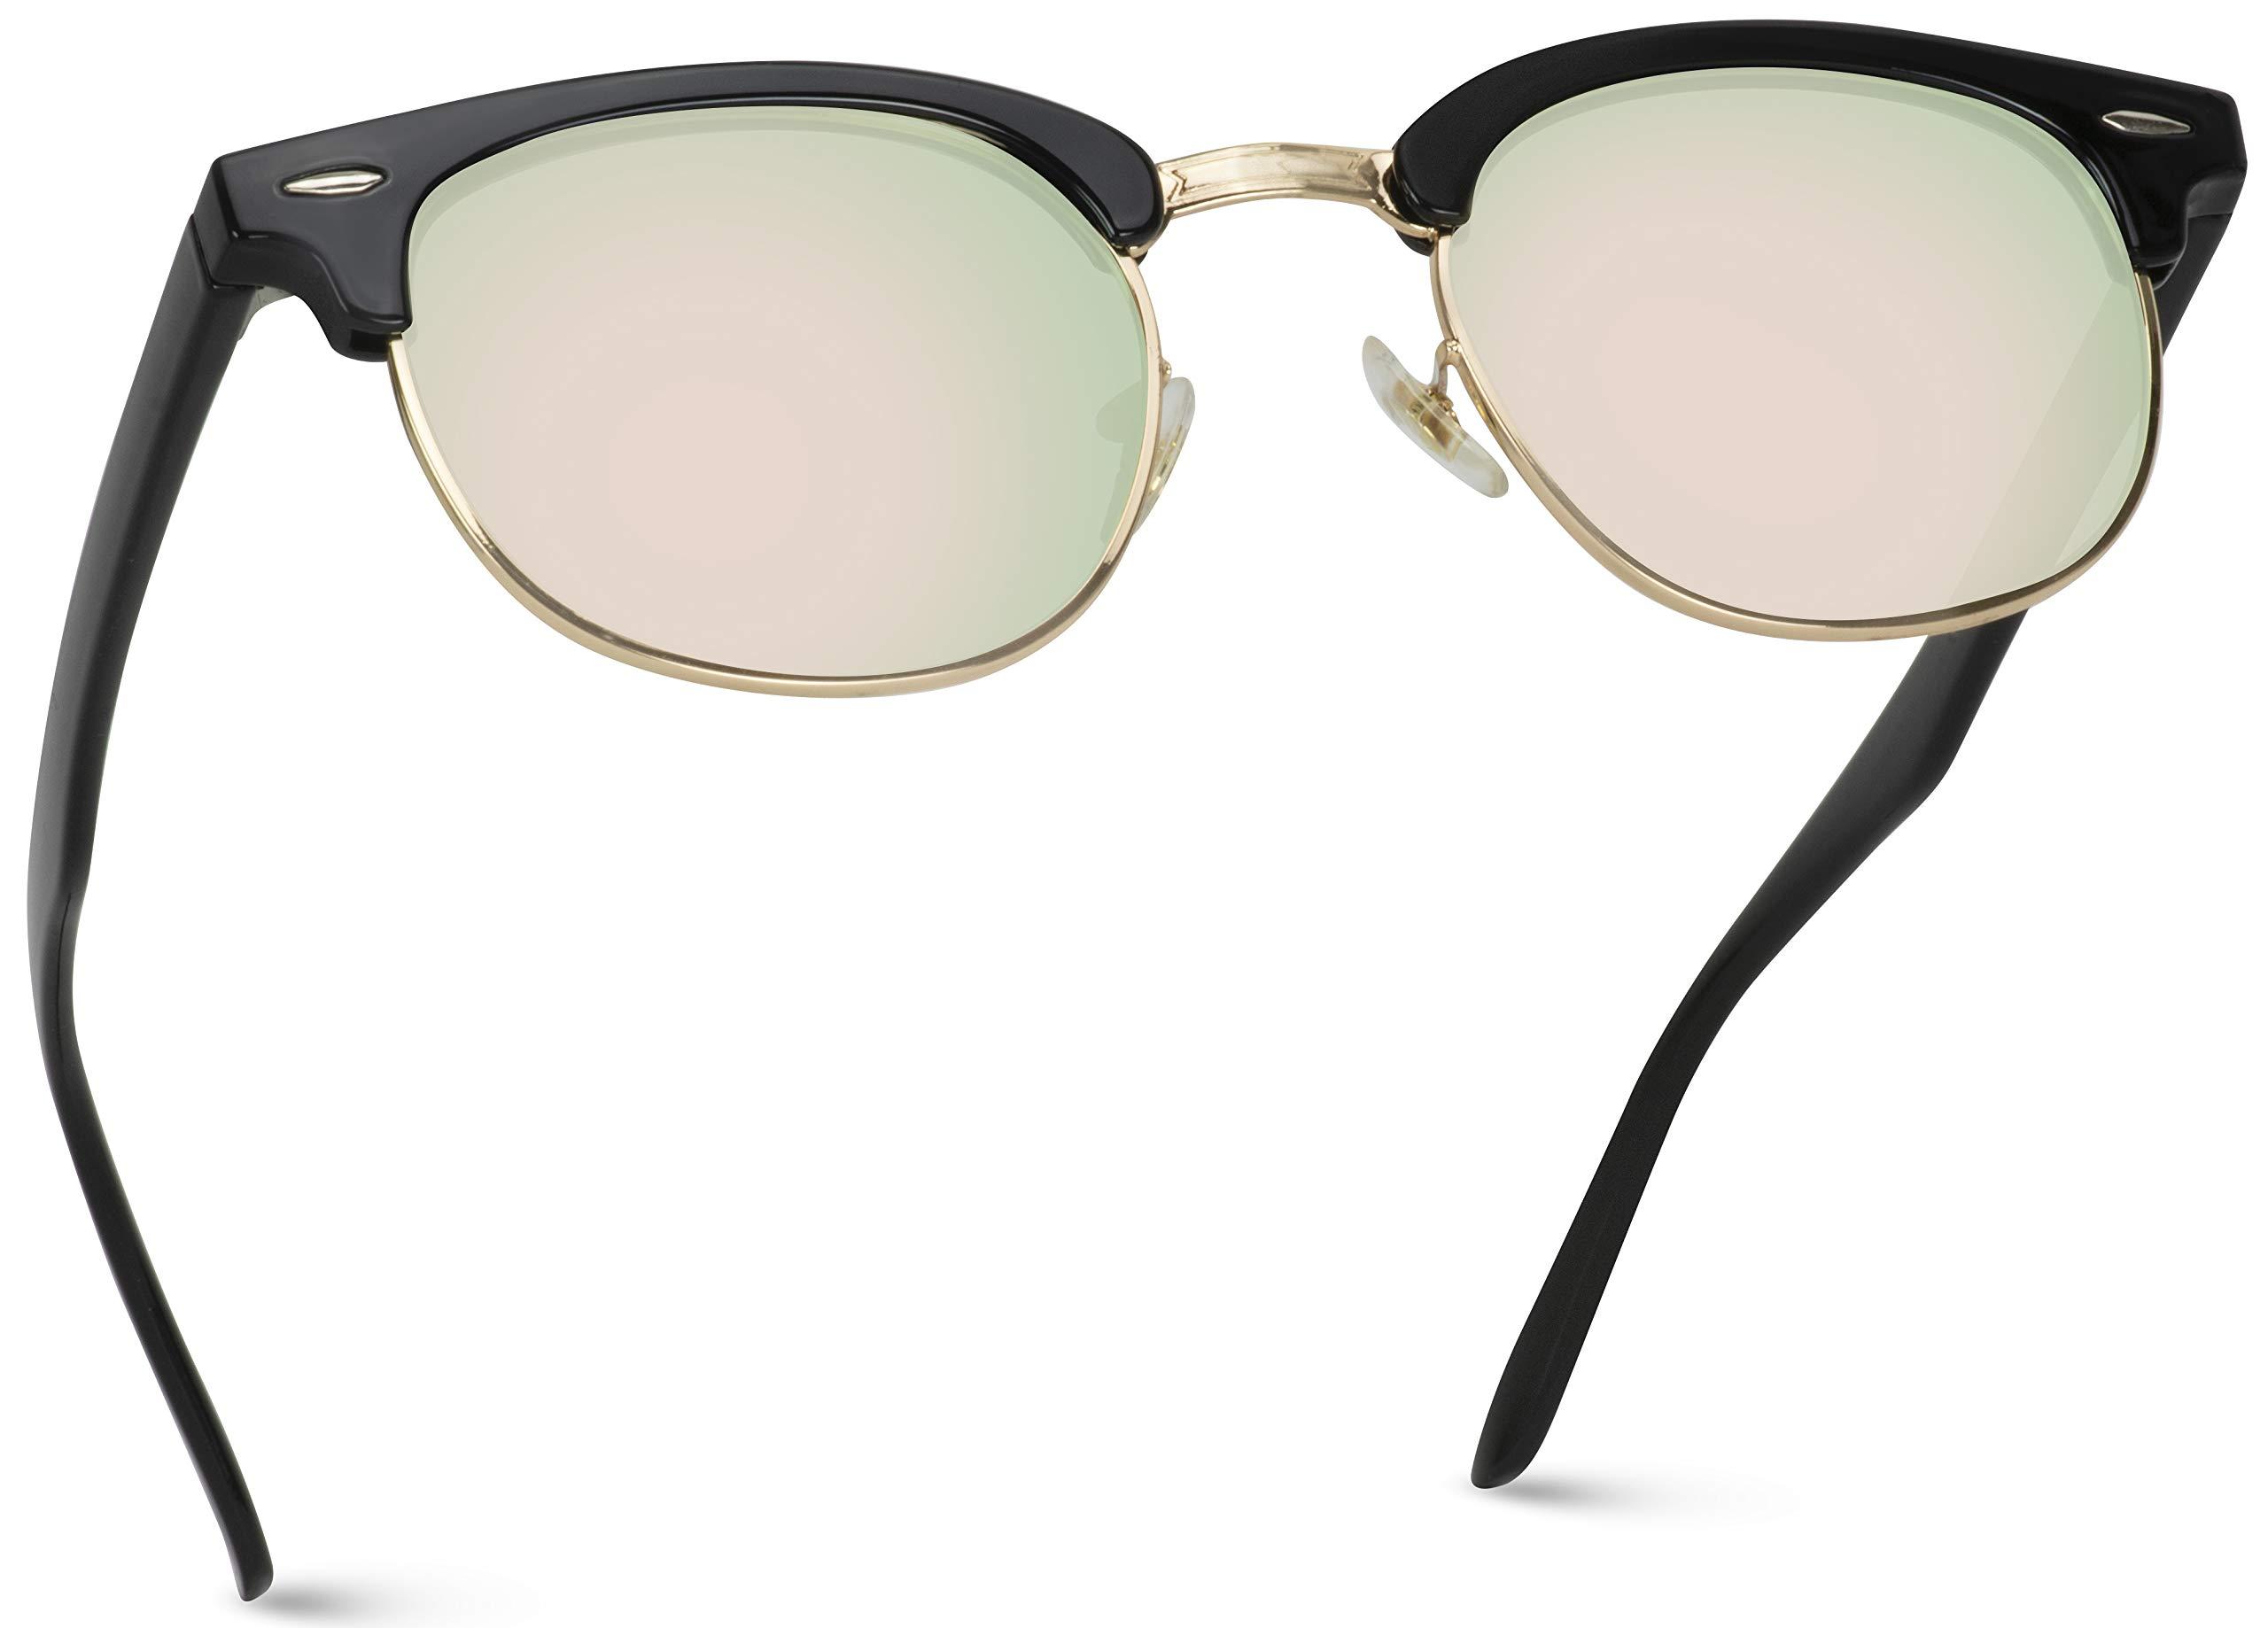 WearMe Pro - Polarized Classic Half Frame Semi Rimless Retro Sunglasses Women Men by WearMe Pro